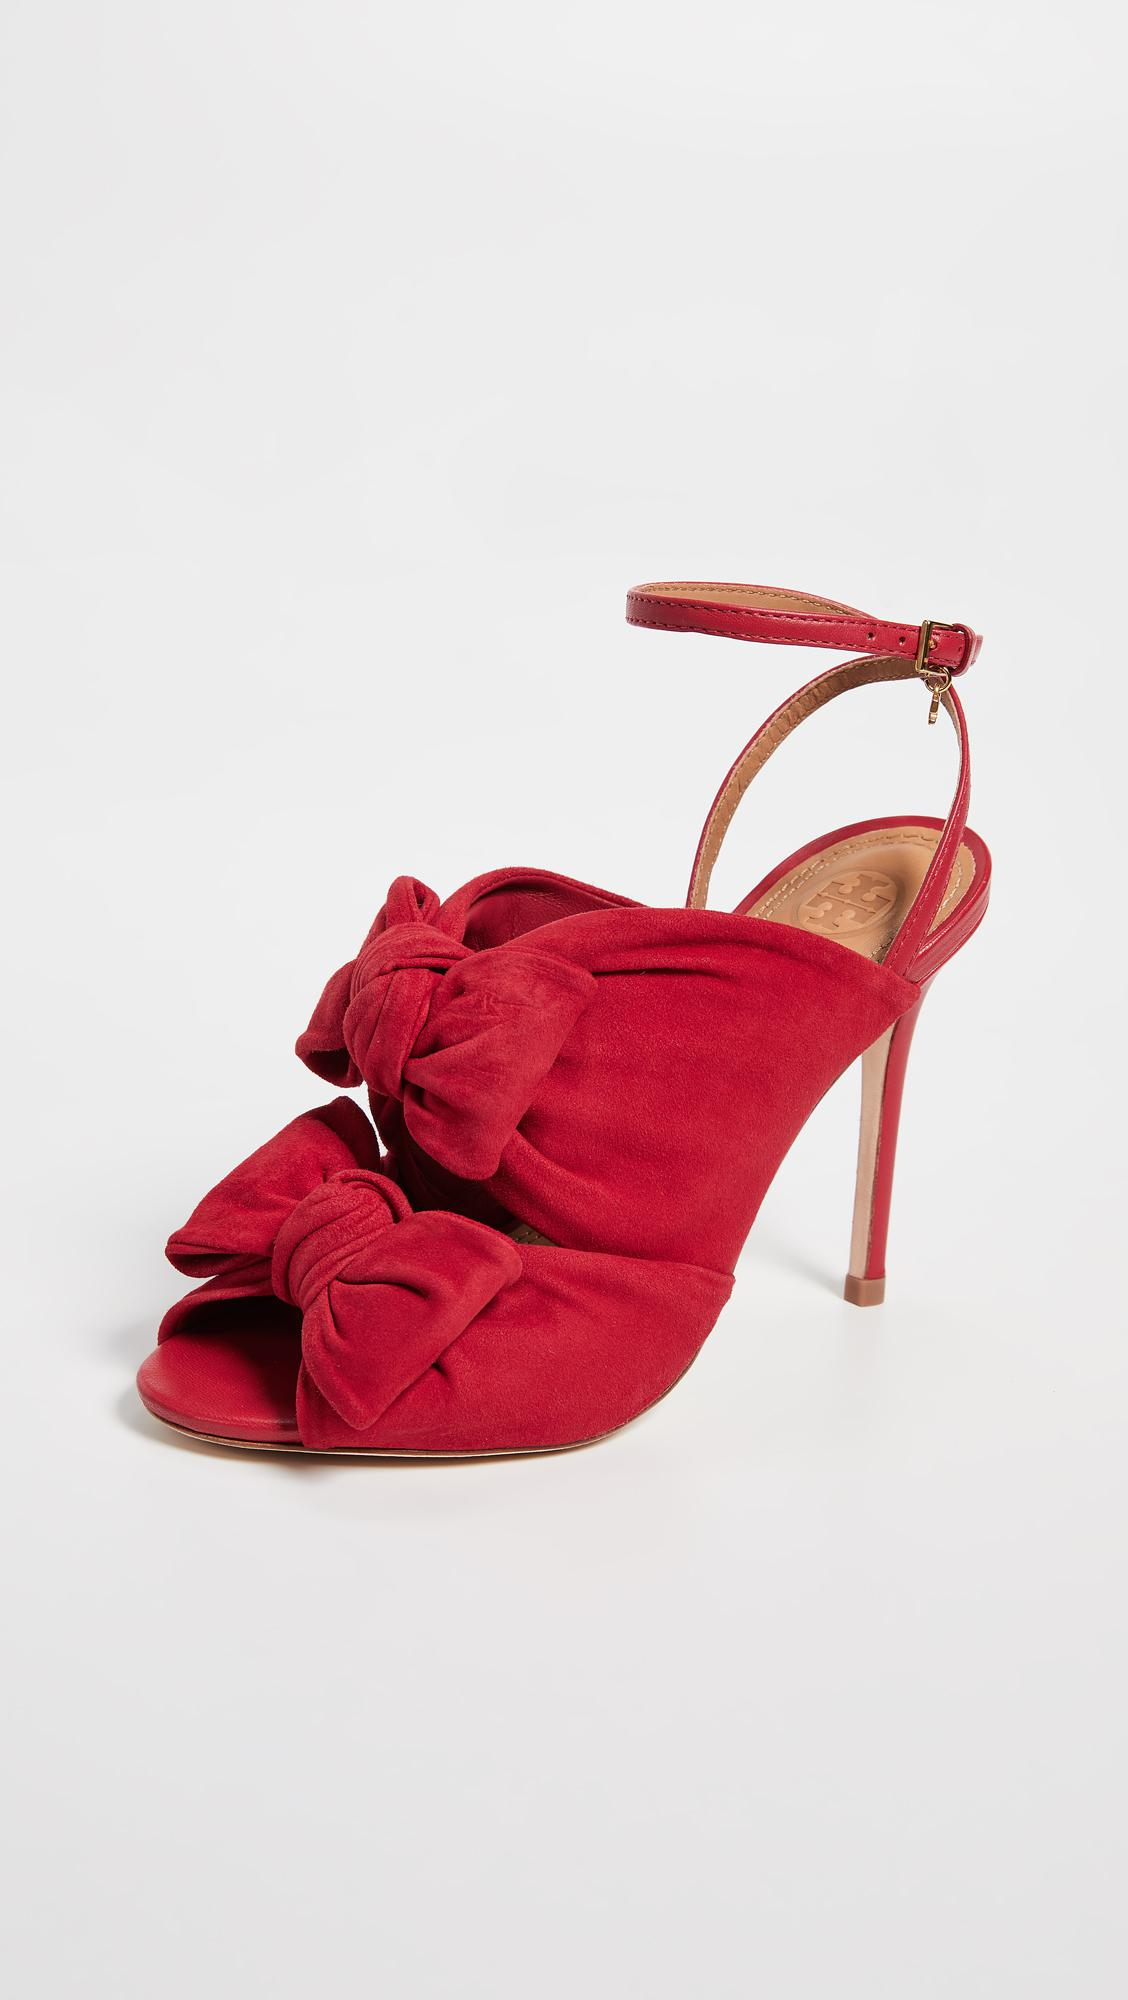 40b1cdab429 Lyst - Tory Burch Eleanor 105mm Sandals in Red